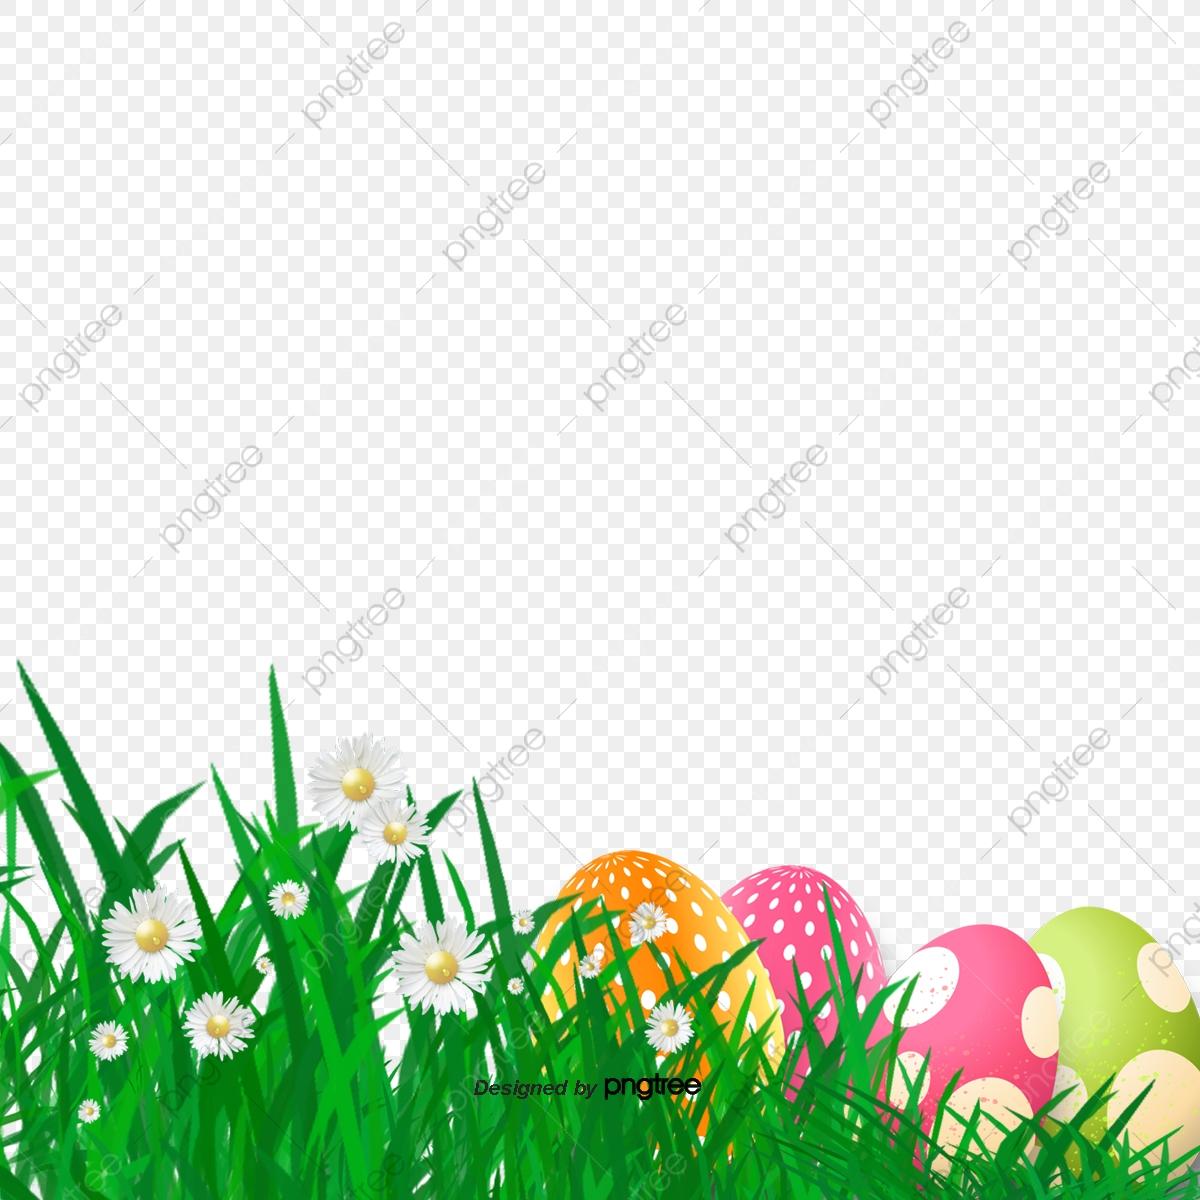 Easter Grass Egg Border Elements, Rabbit, Resurrection Rabbit.